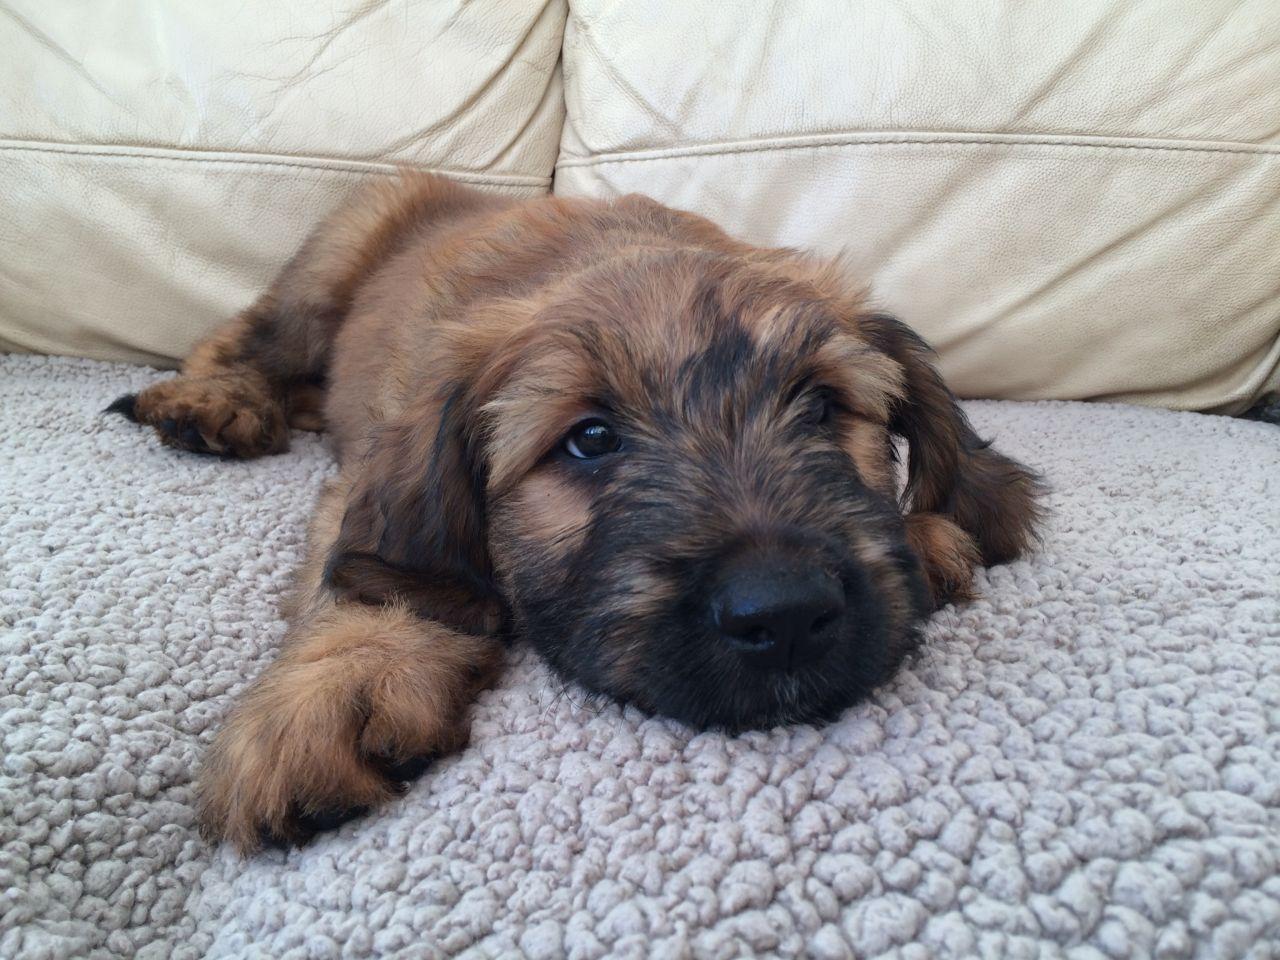 Briard Puppies, Dog Photos, Dog Breed Information - Doglers